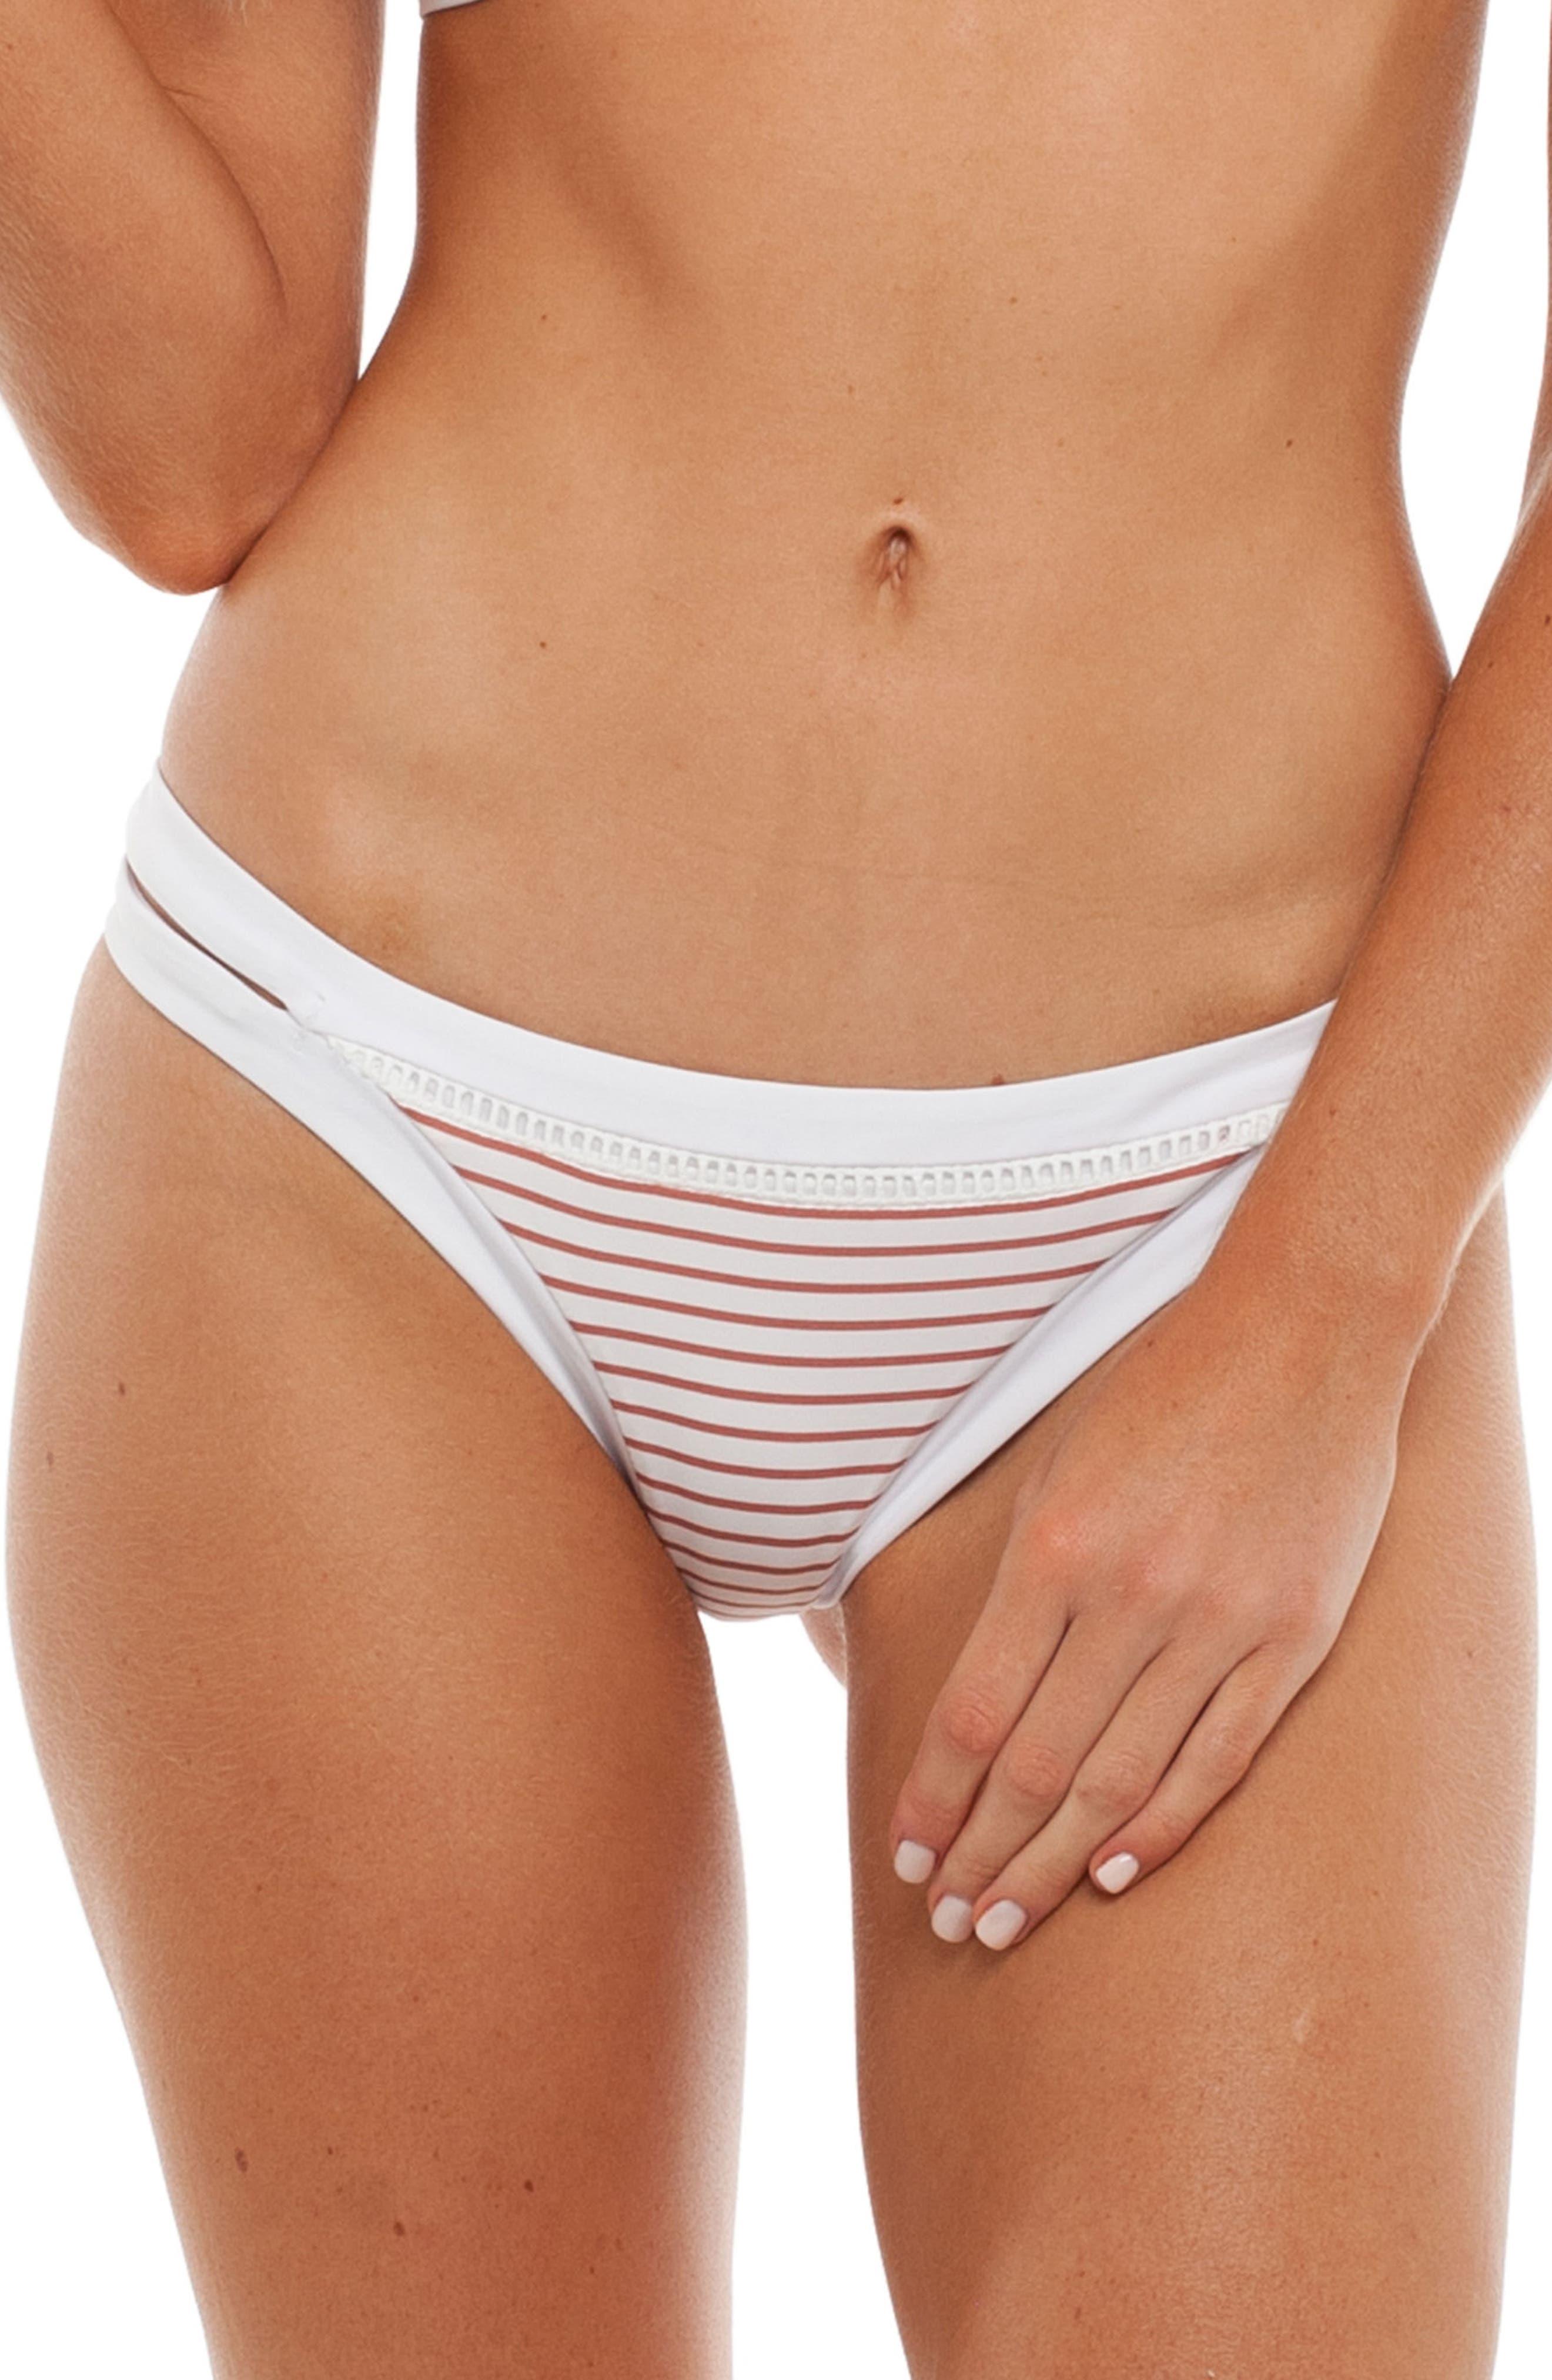 Rhythm Sunkissed Itsy Bikini Bottoms, Pink